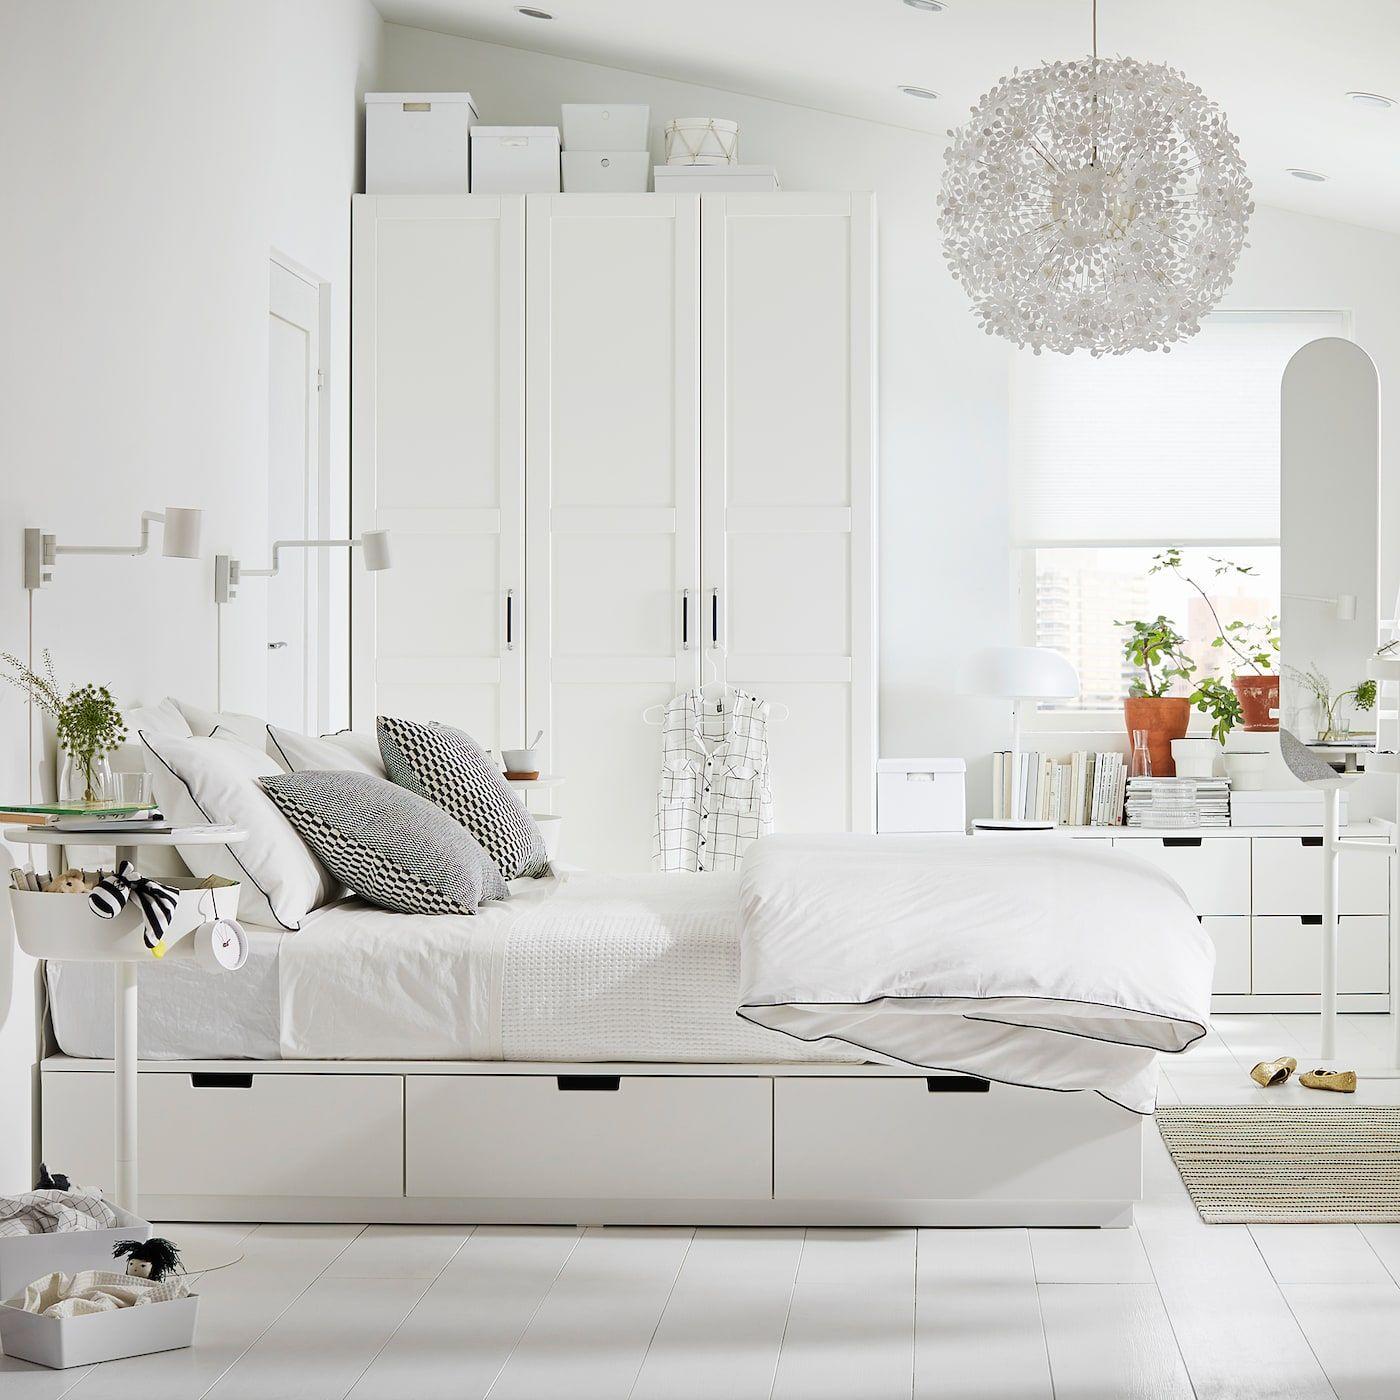 Nordli Estructura De Cama Con Almacenaje Blanco 140x200 Cm Ikea Bed Frame With Storage Bed Frame Ikea Bed